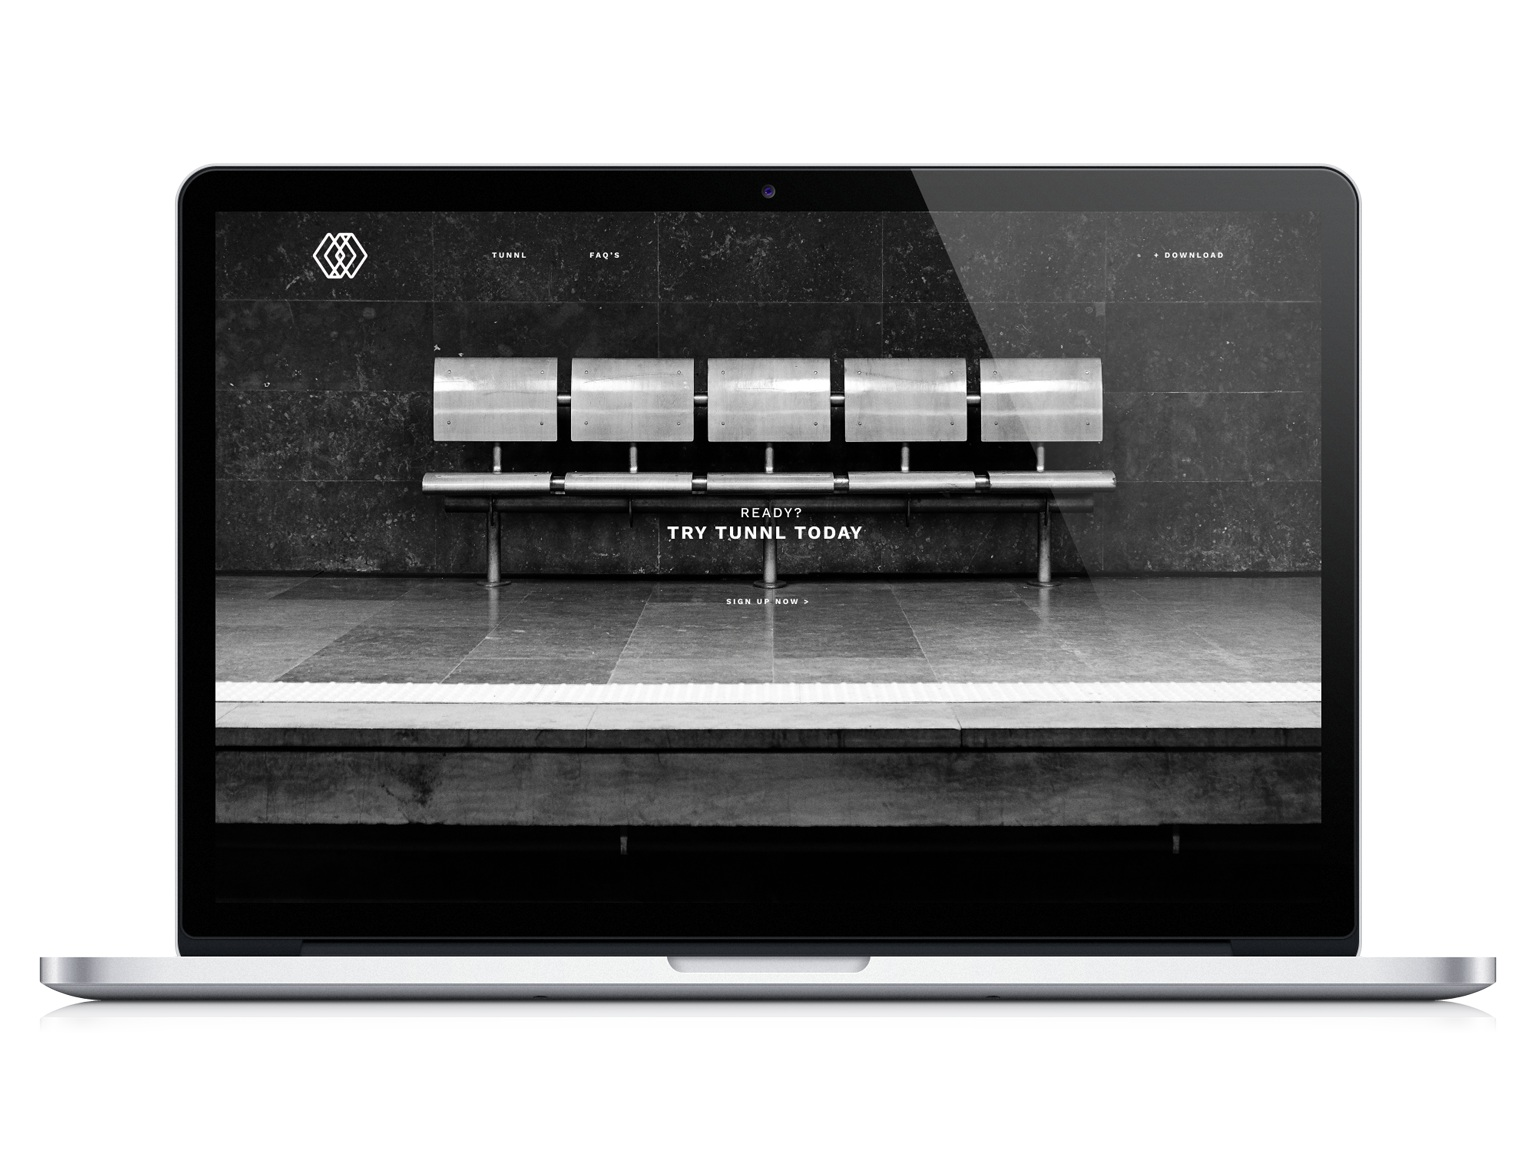 MacBook-Pro-mockup-4.jpg